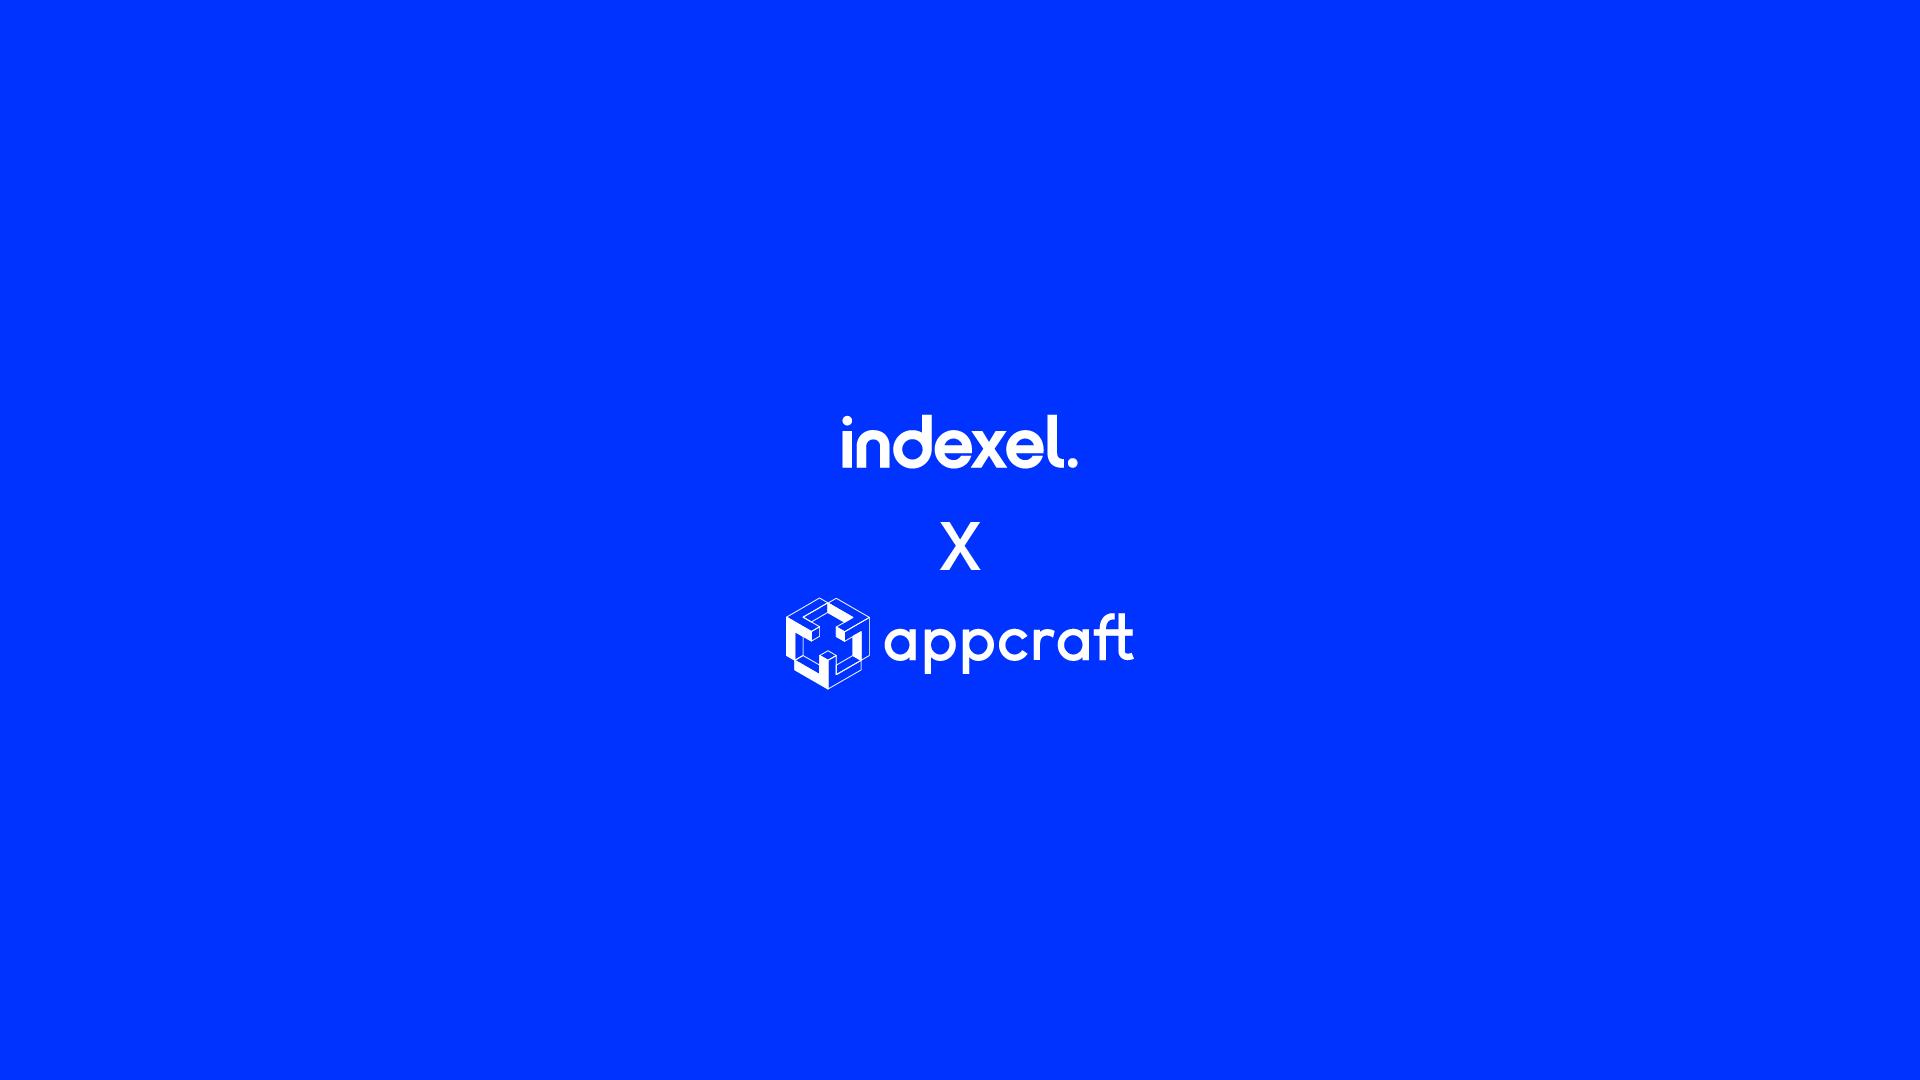 appcraftXindexel